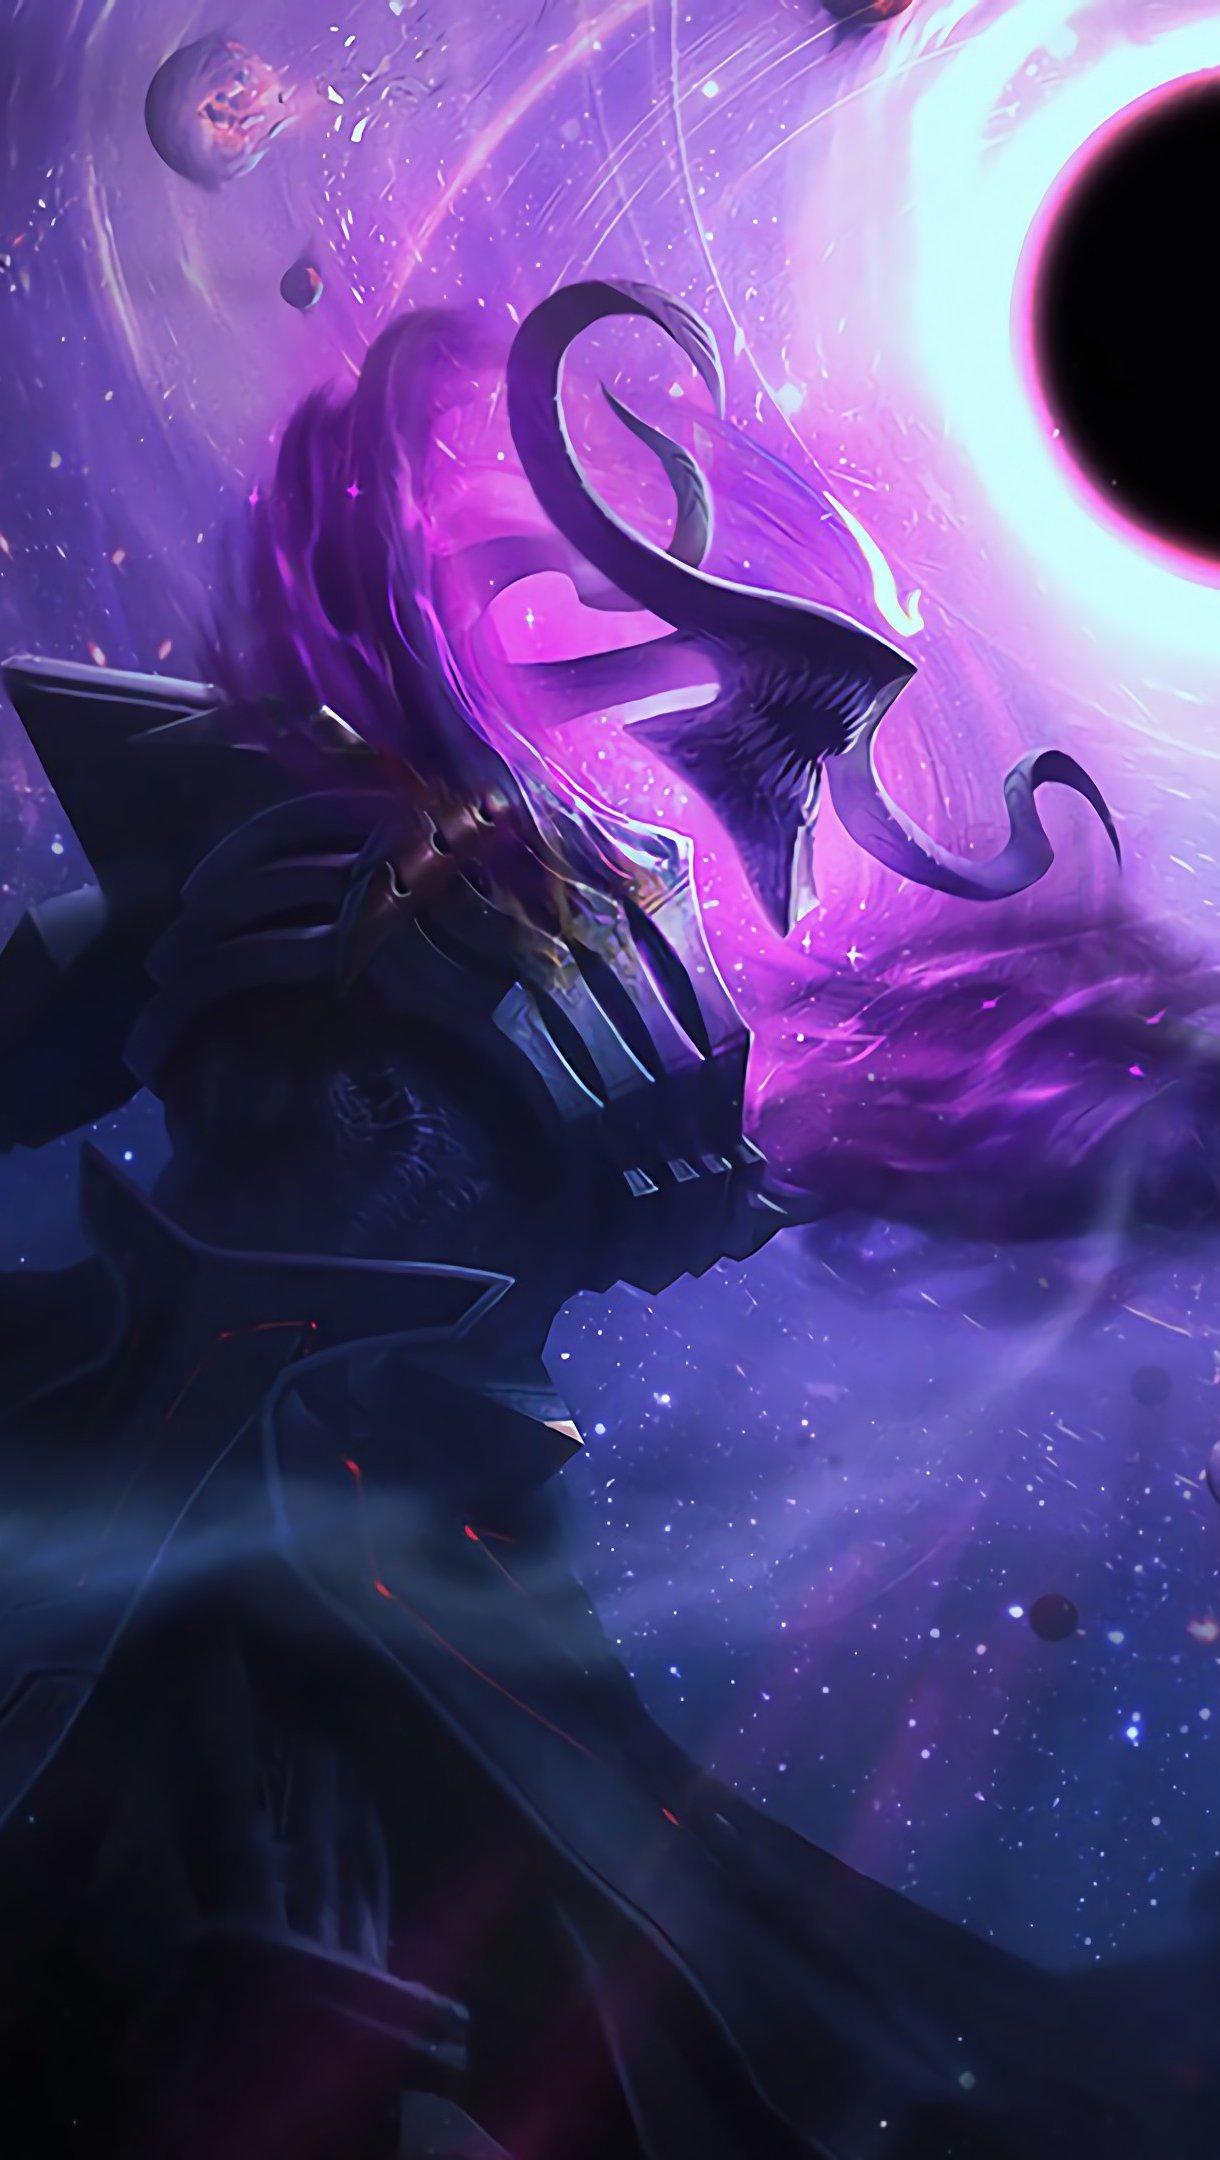 Fondos de pantalla Dark Star Thresh League of Legends Vertical